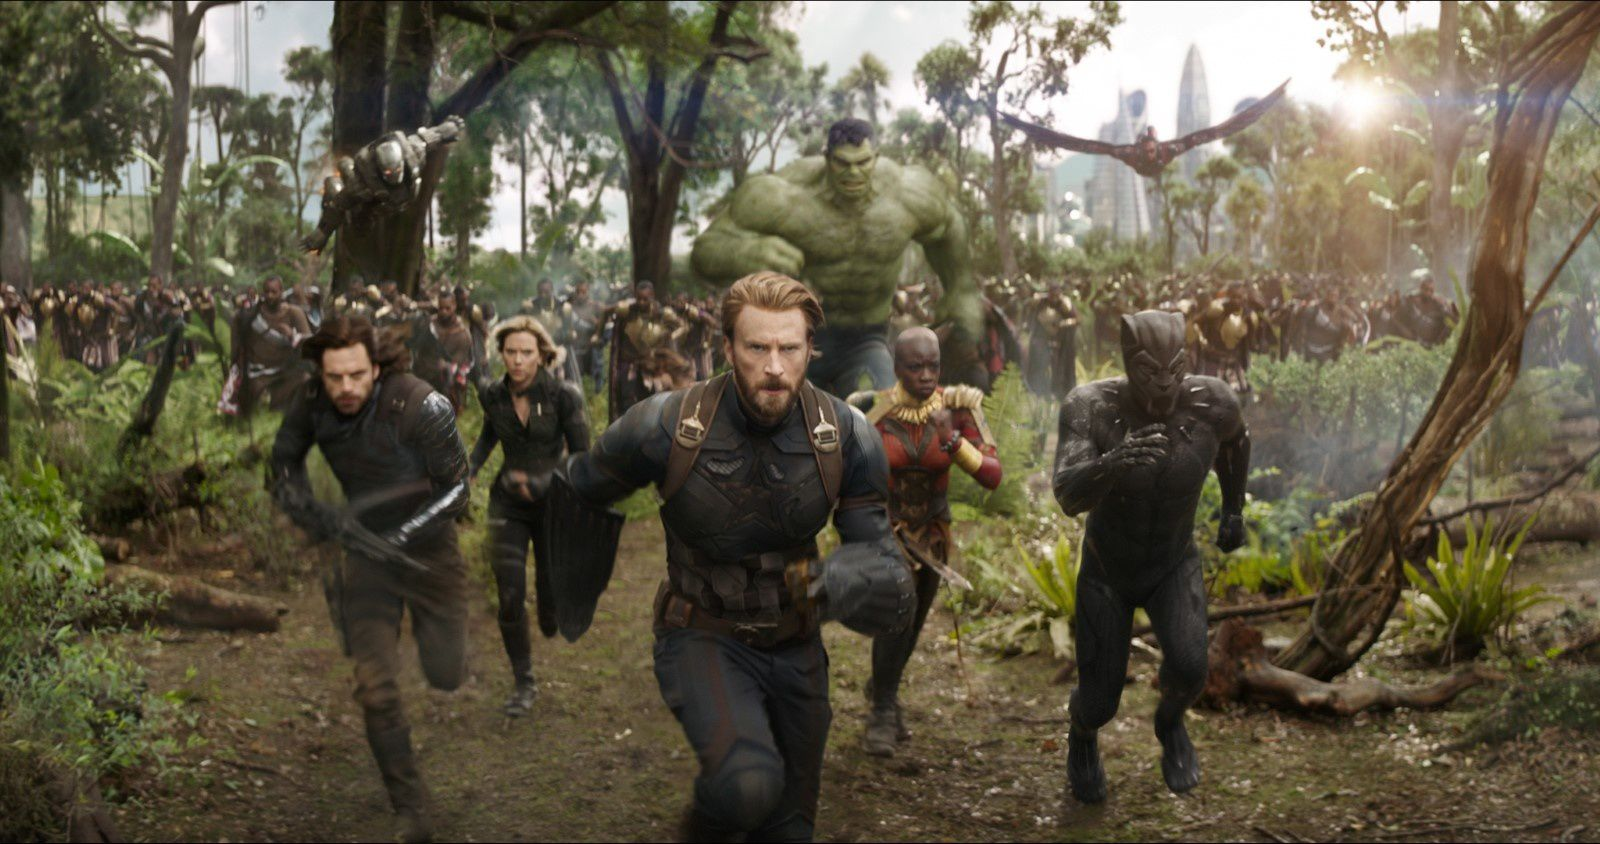 Avis ciné : Avengers - Infinity War - Captain America Chris Evans - Black Panther - Scarlett Johansson - le blog d'Akialam